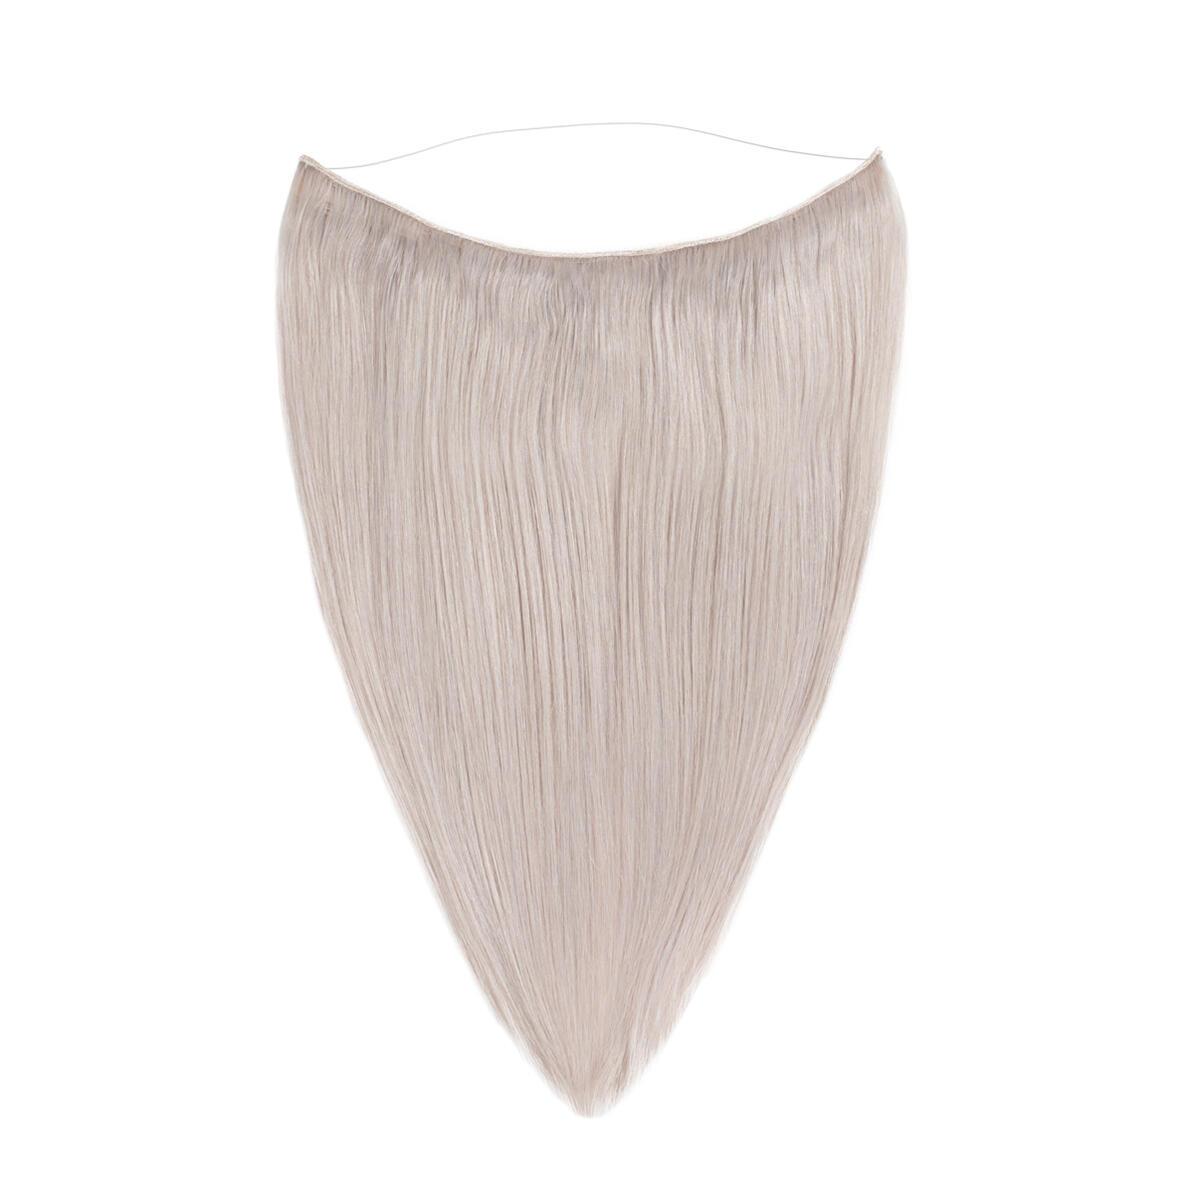 Hairband Original 10.5 Grey 45 cm